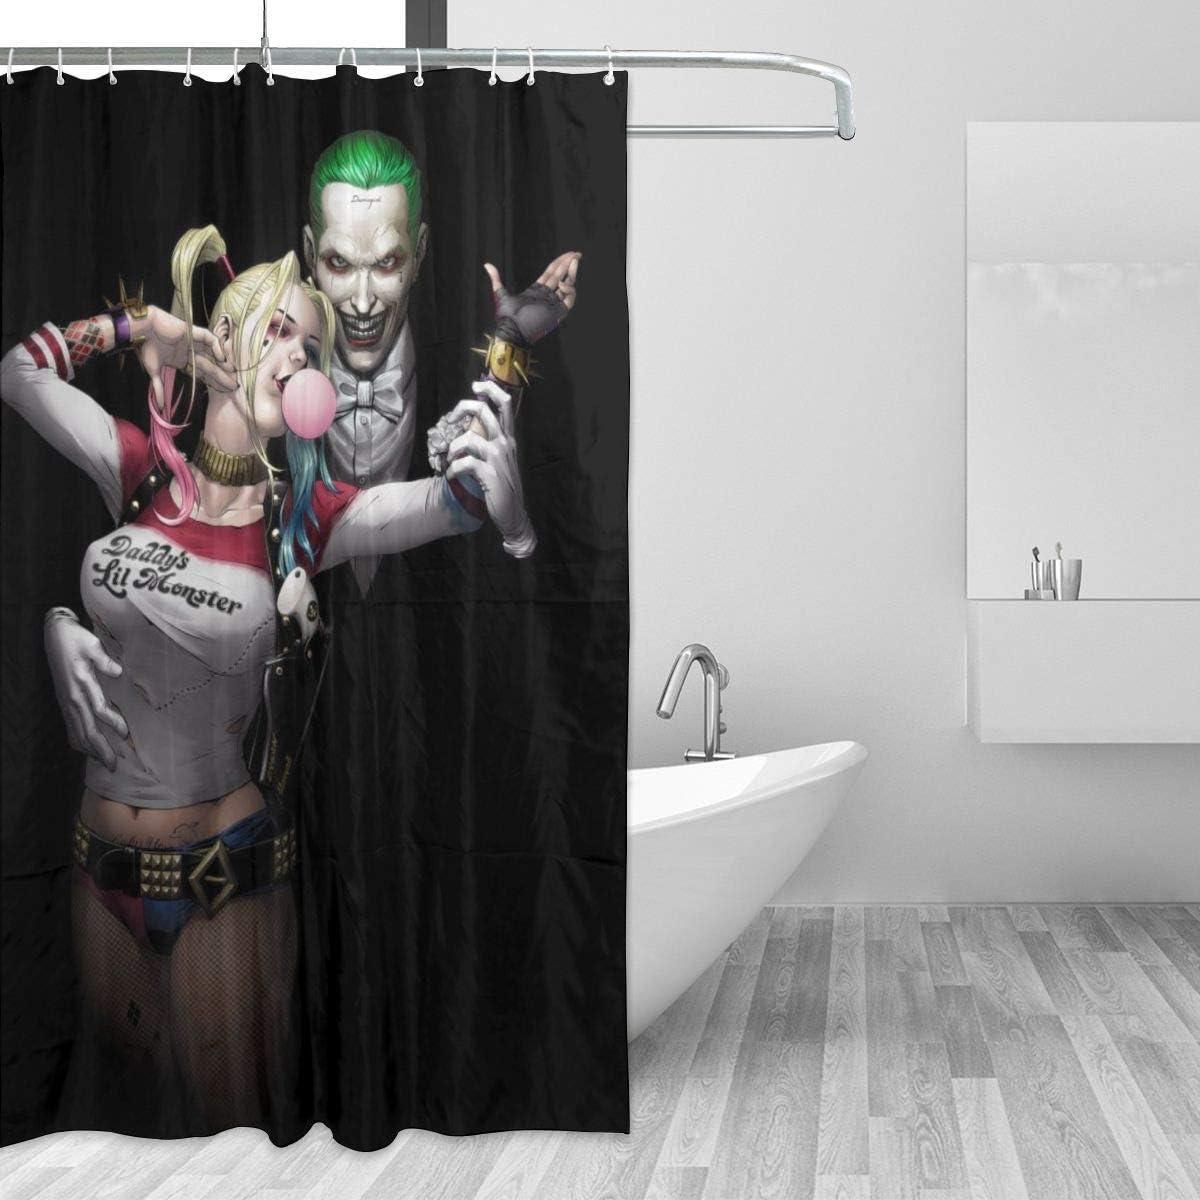 Amazon.com: HOHOHAHE Harley Quinn and Joker Shower Curtain